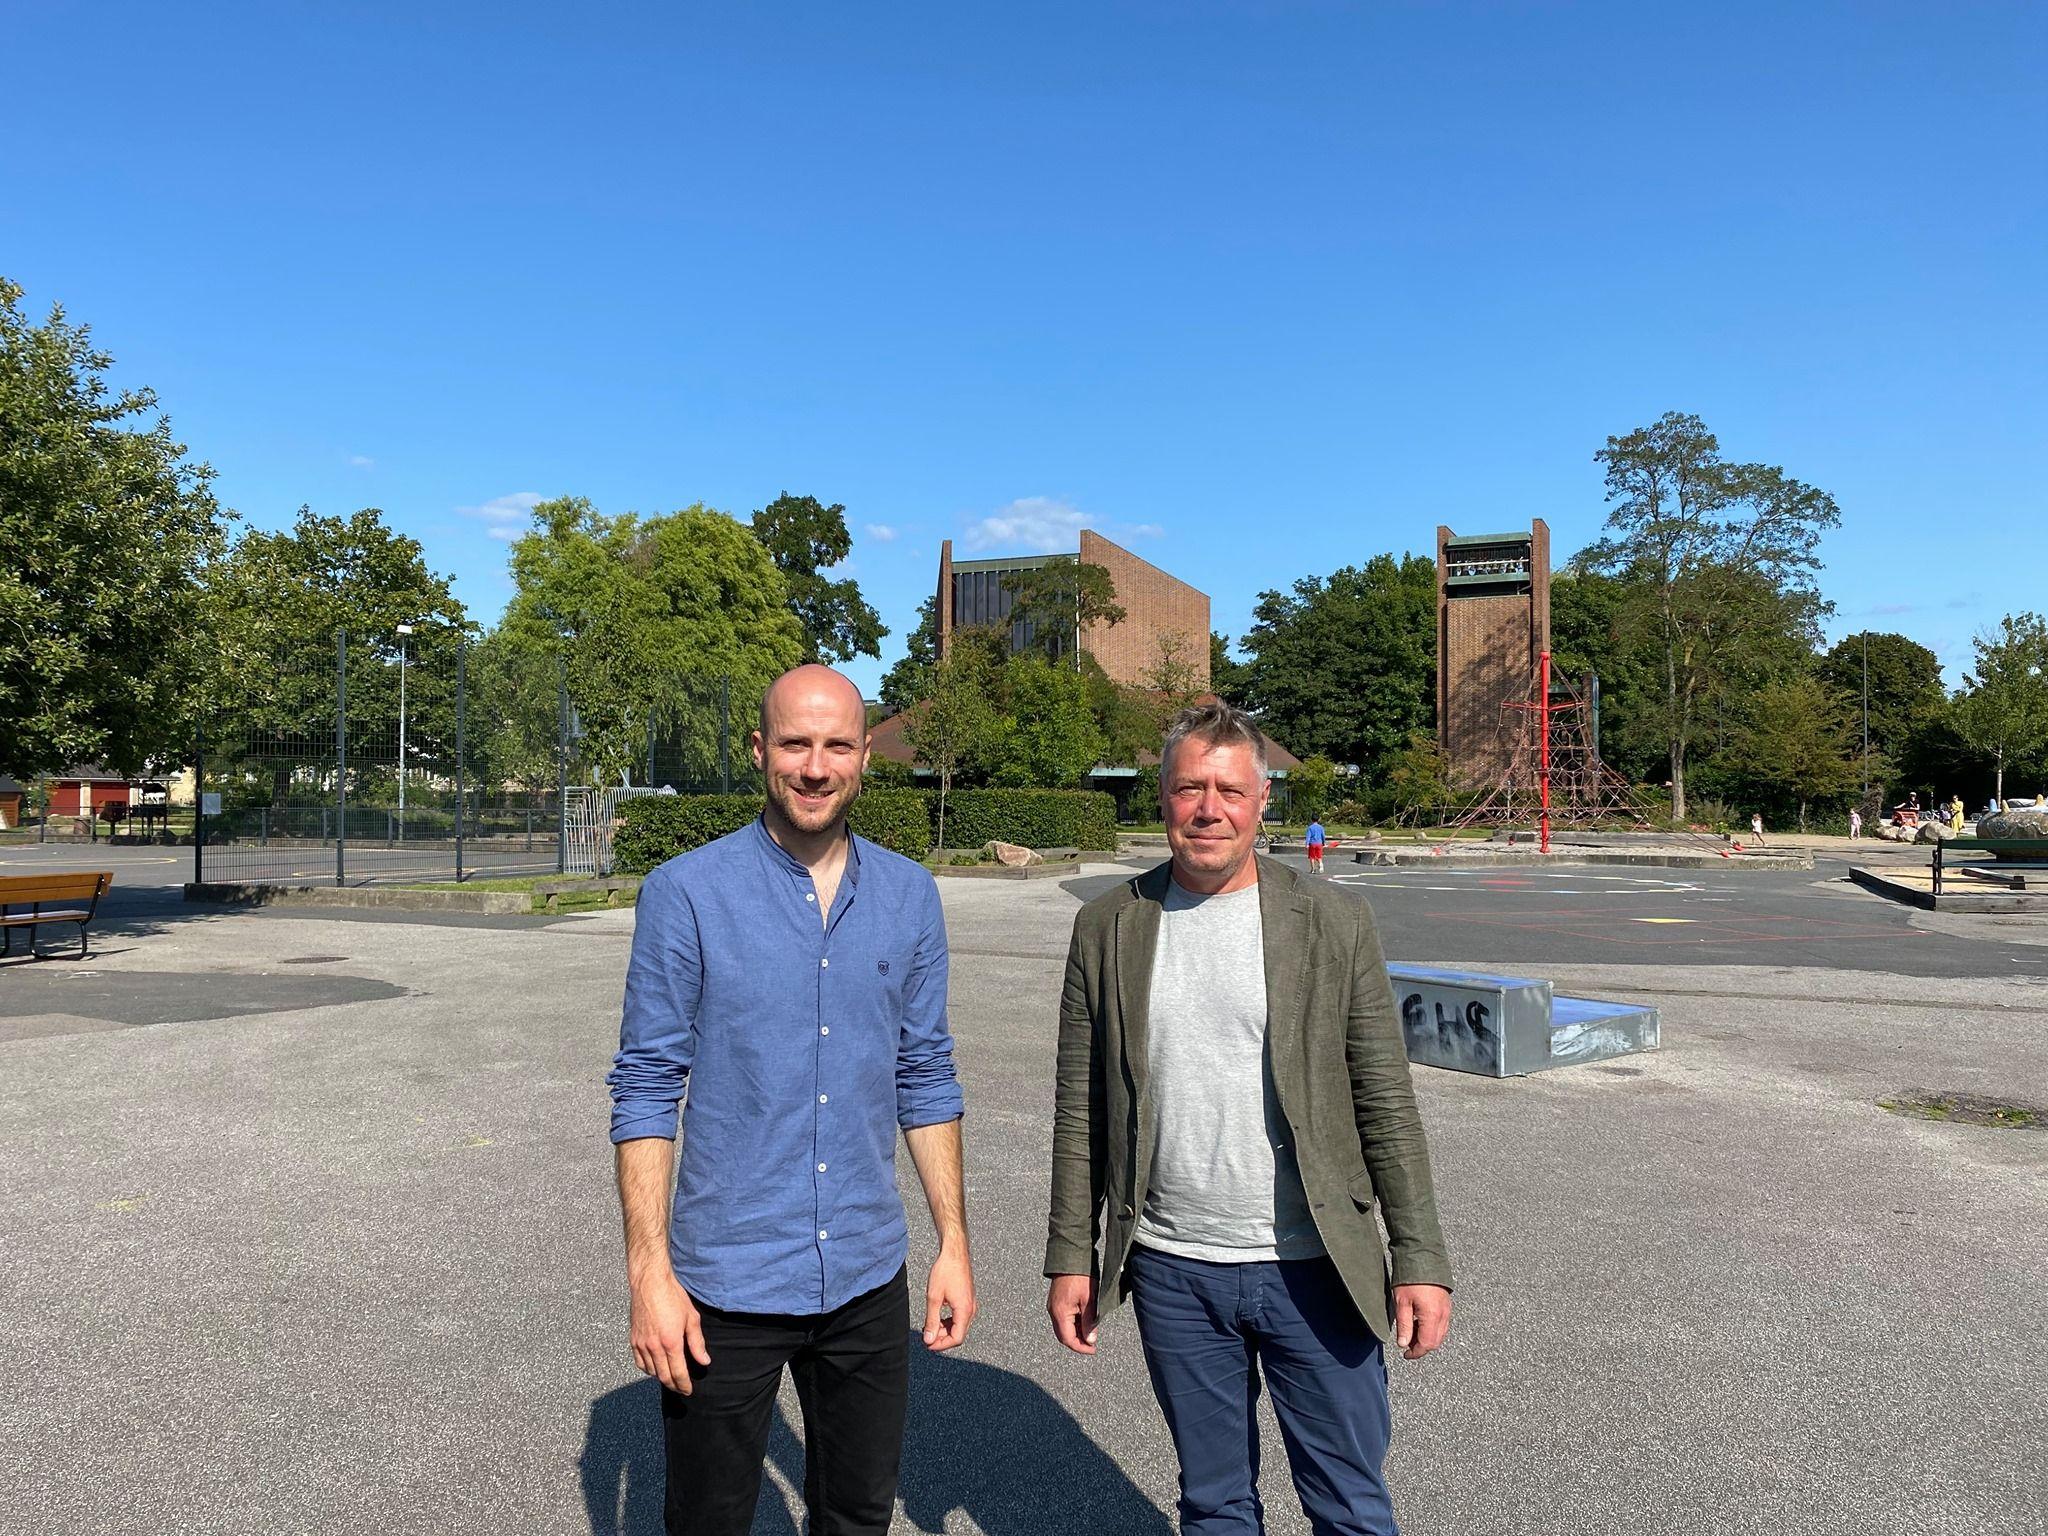 Jakob og Sune arkitekter byrum Folehaven